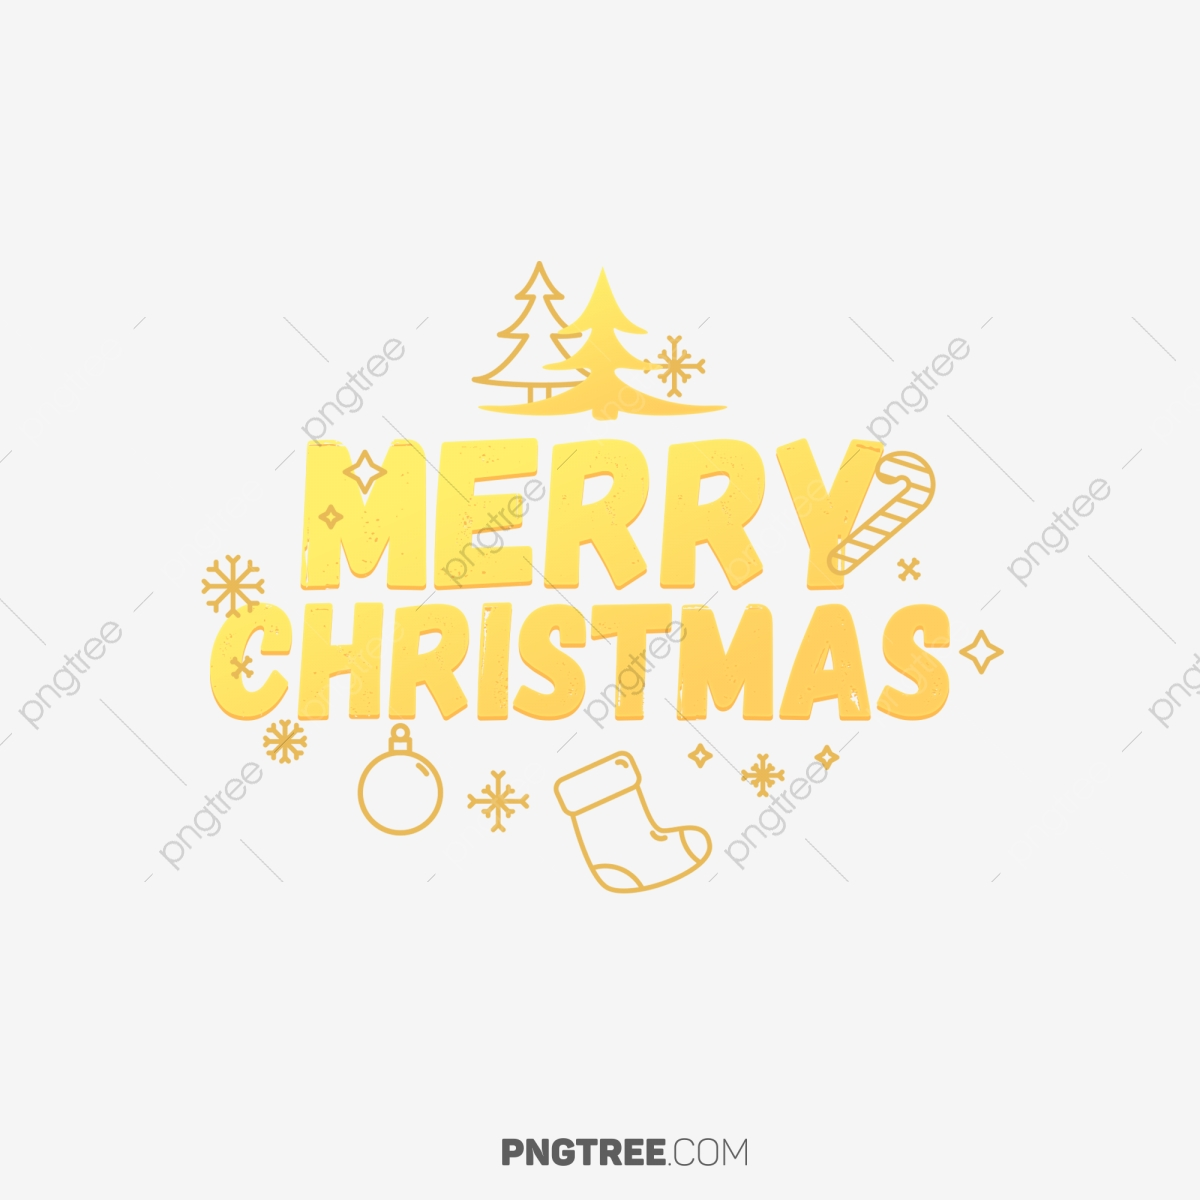 Merry Christmas Banner Transparent Design, Christmas, Eve.